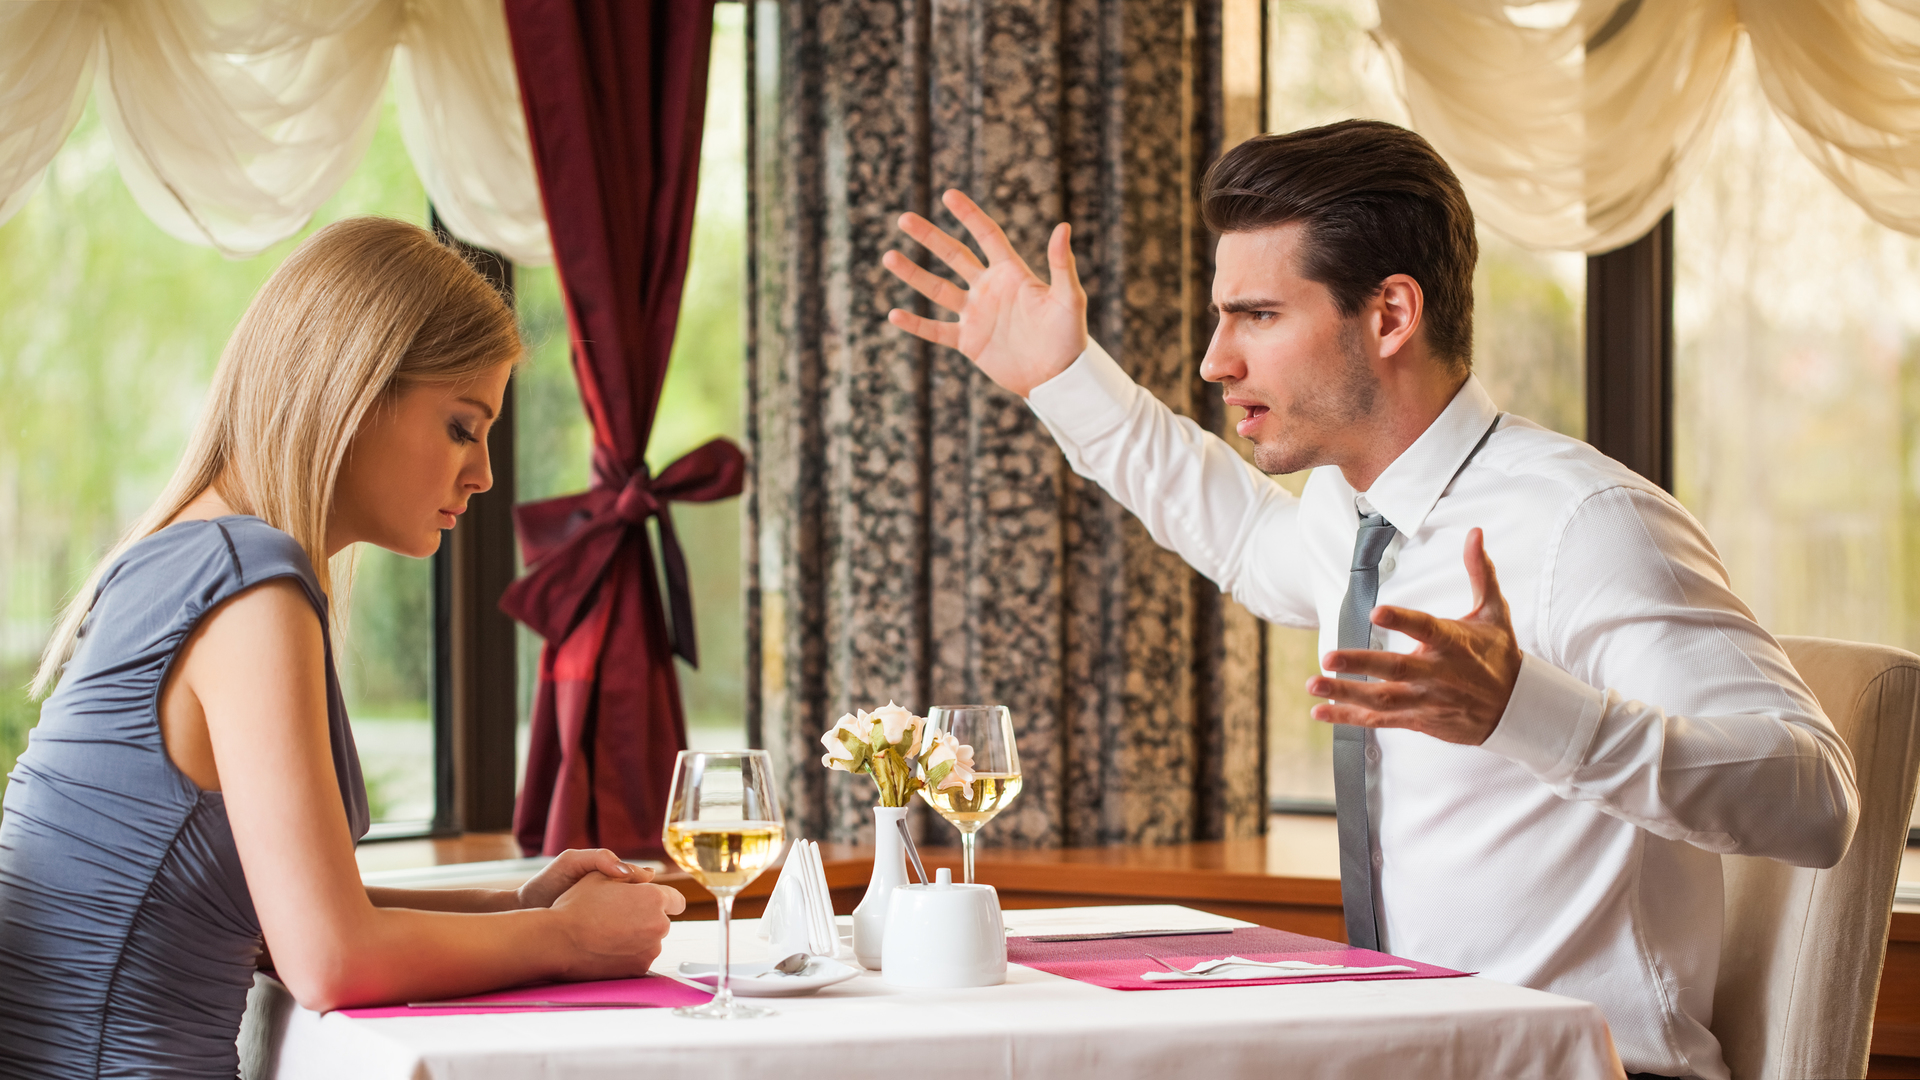 How we met and the online dating scene